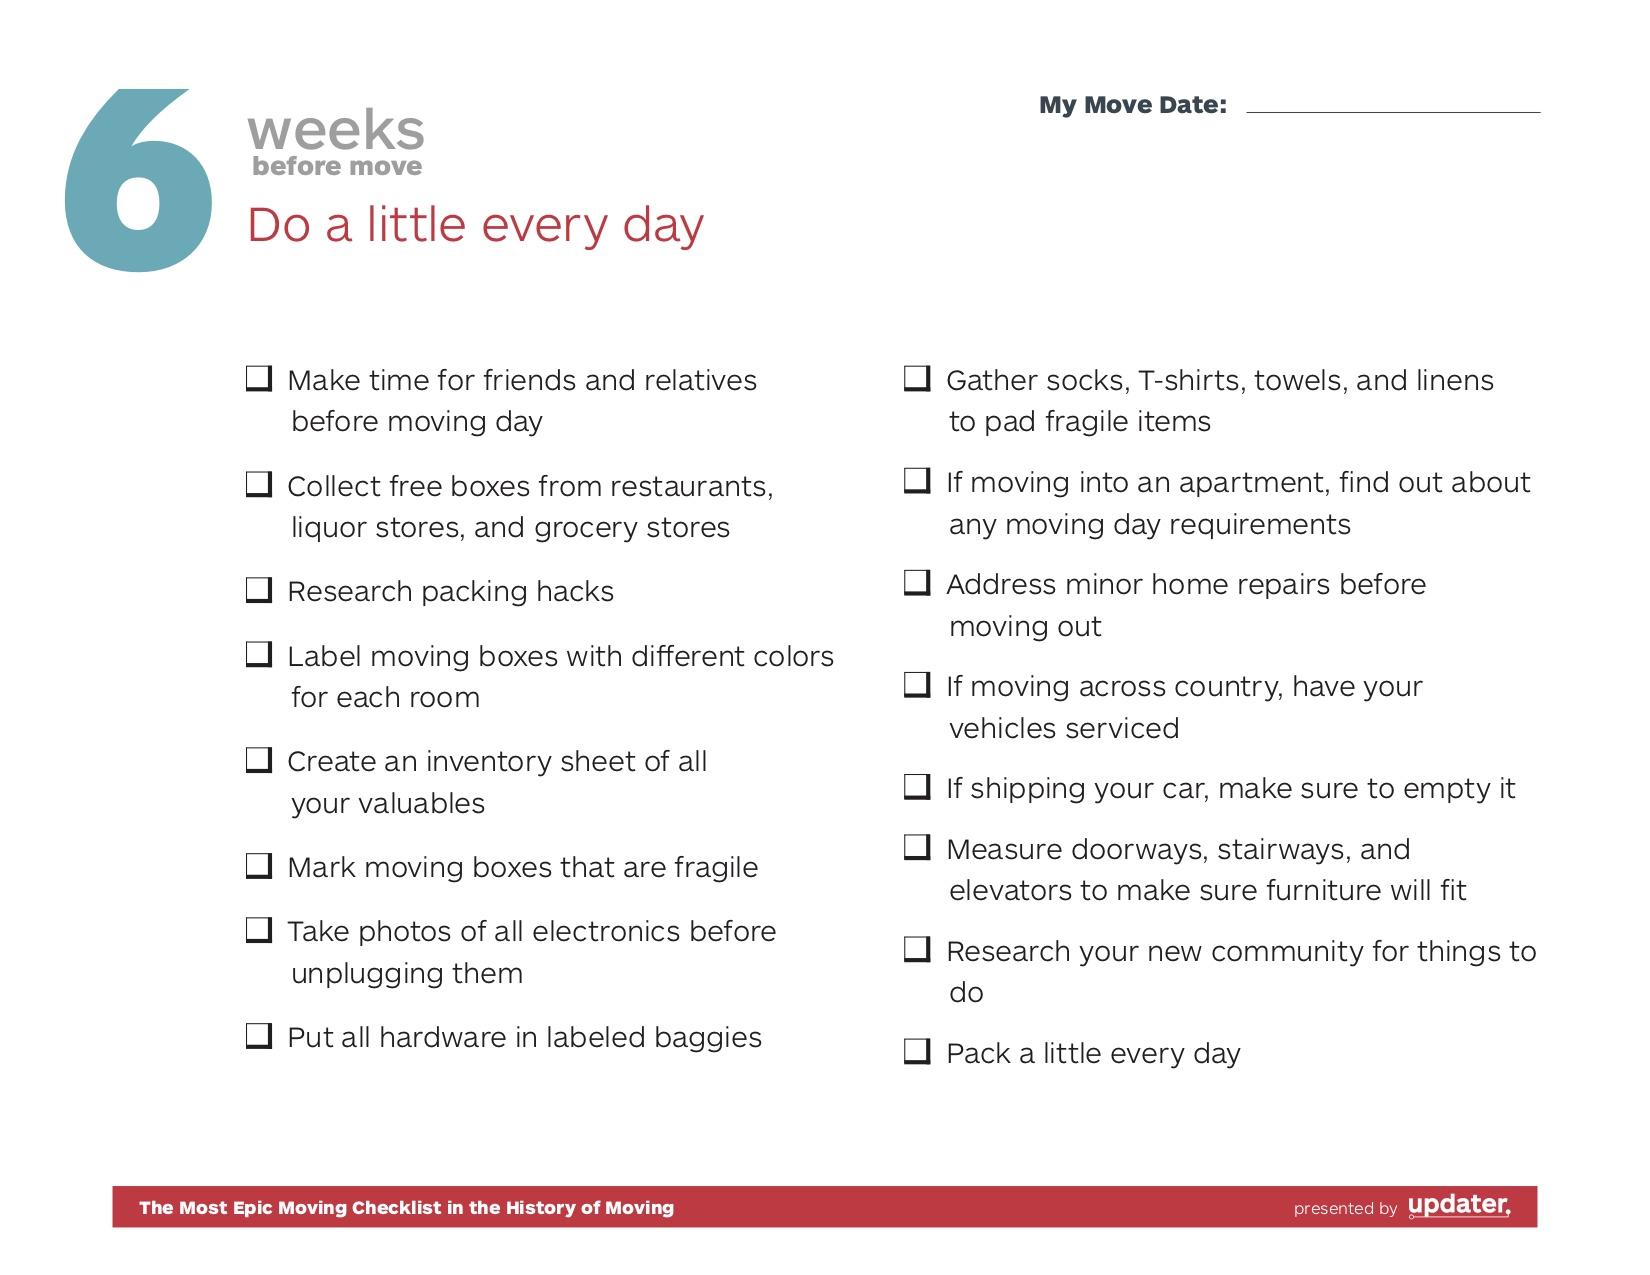 moving-checklist-6wks.jpg